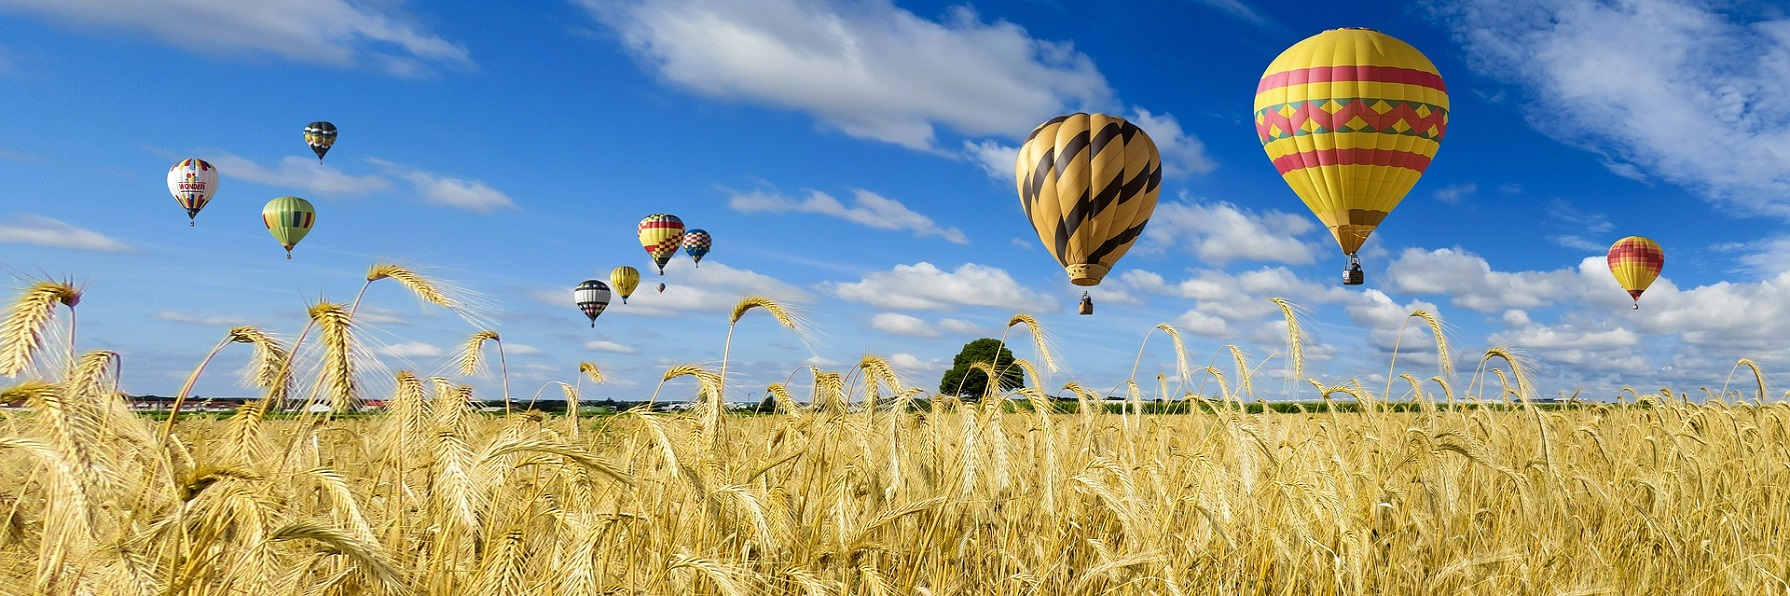 balloons-1920x596